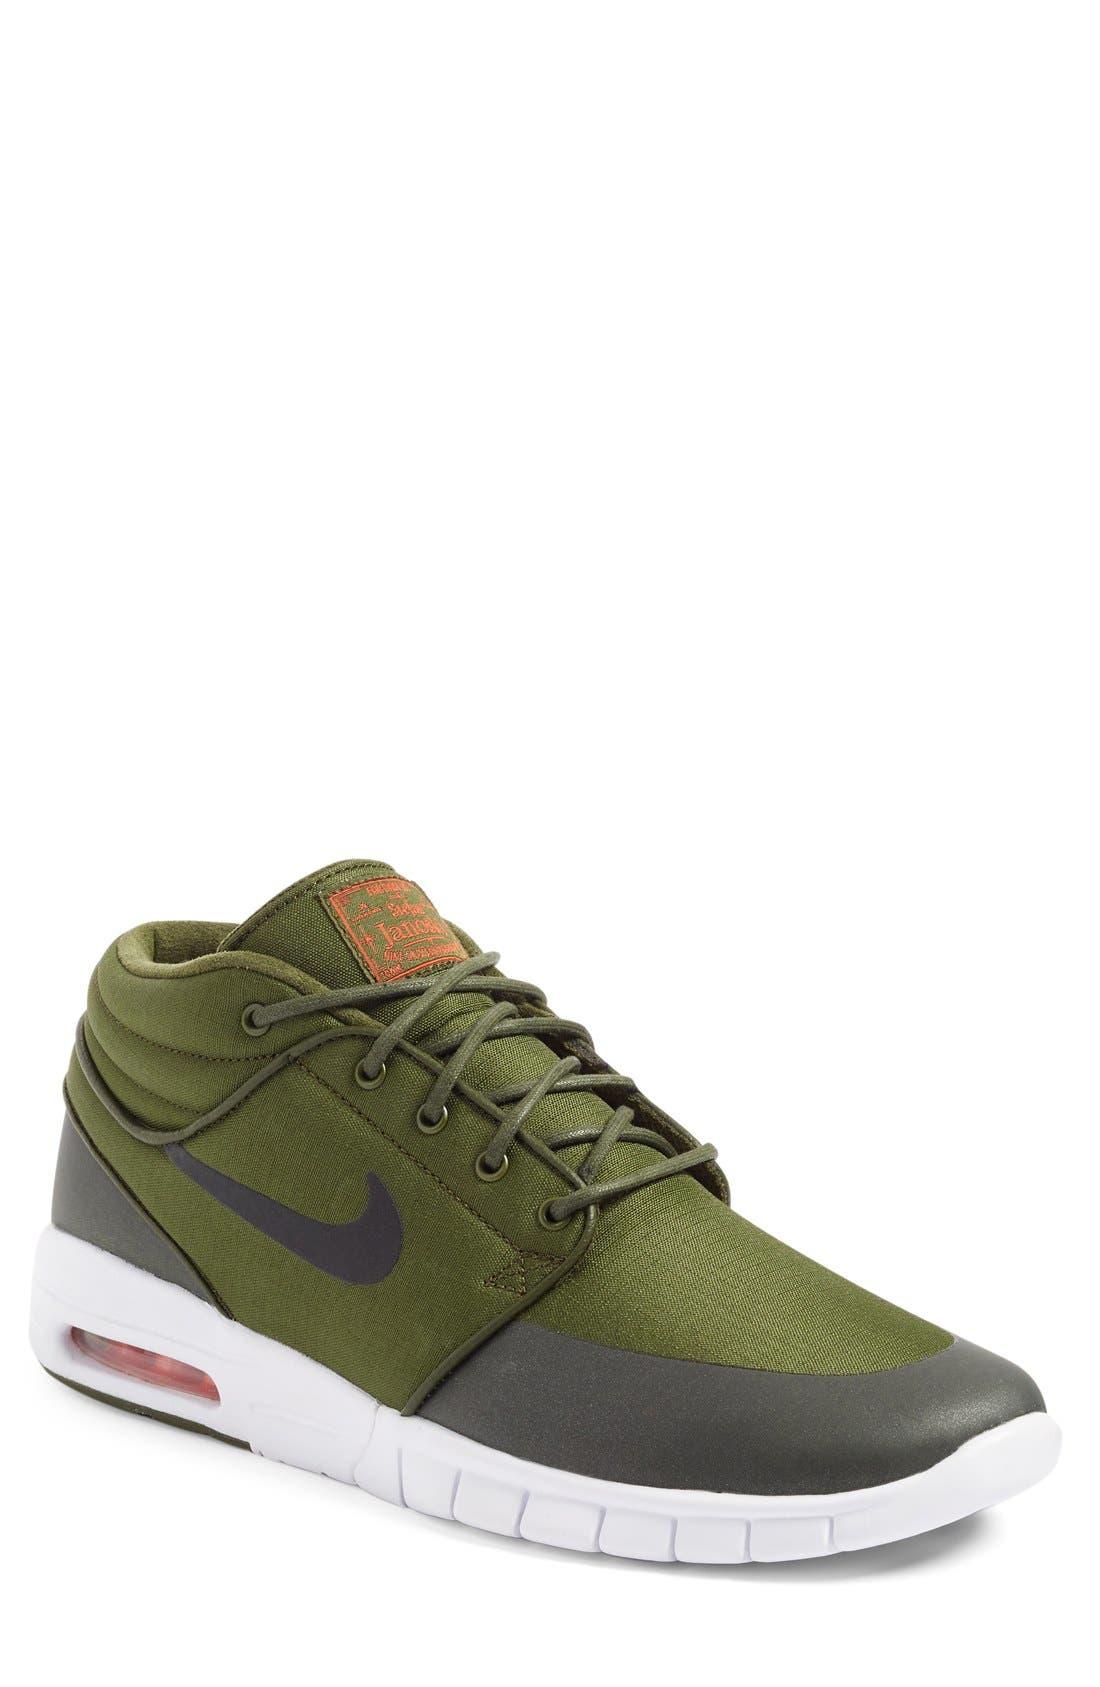 Alternate Image 1 Selected - Nike SB Stefan Janoski Max Mid Skate Shoe (Men)